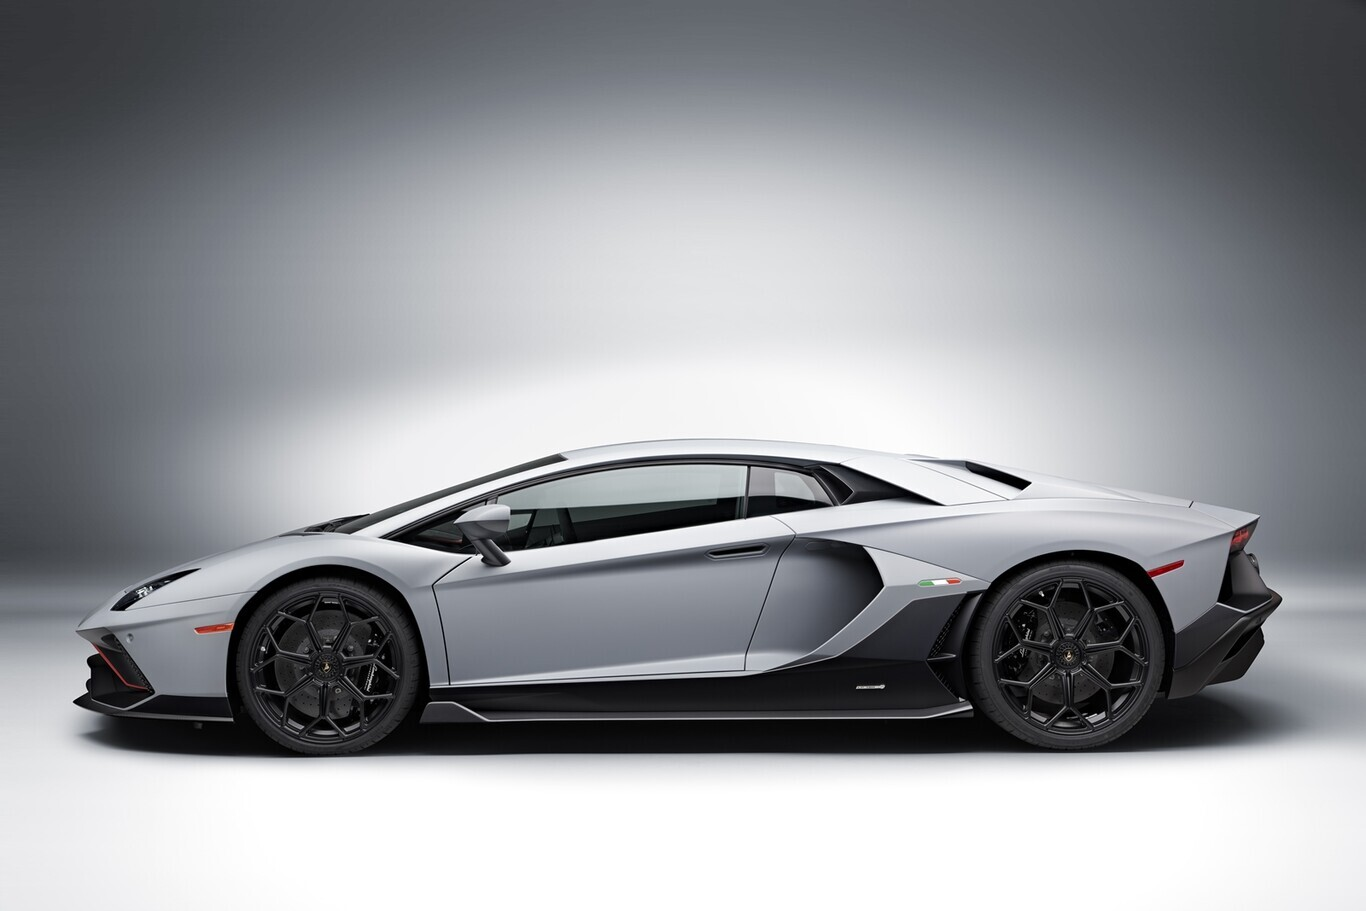 Foto de Lamborghini Aventador LP780-4 Ultimae (4/18)